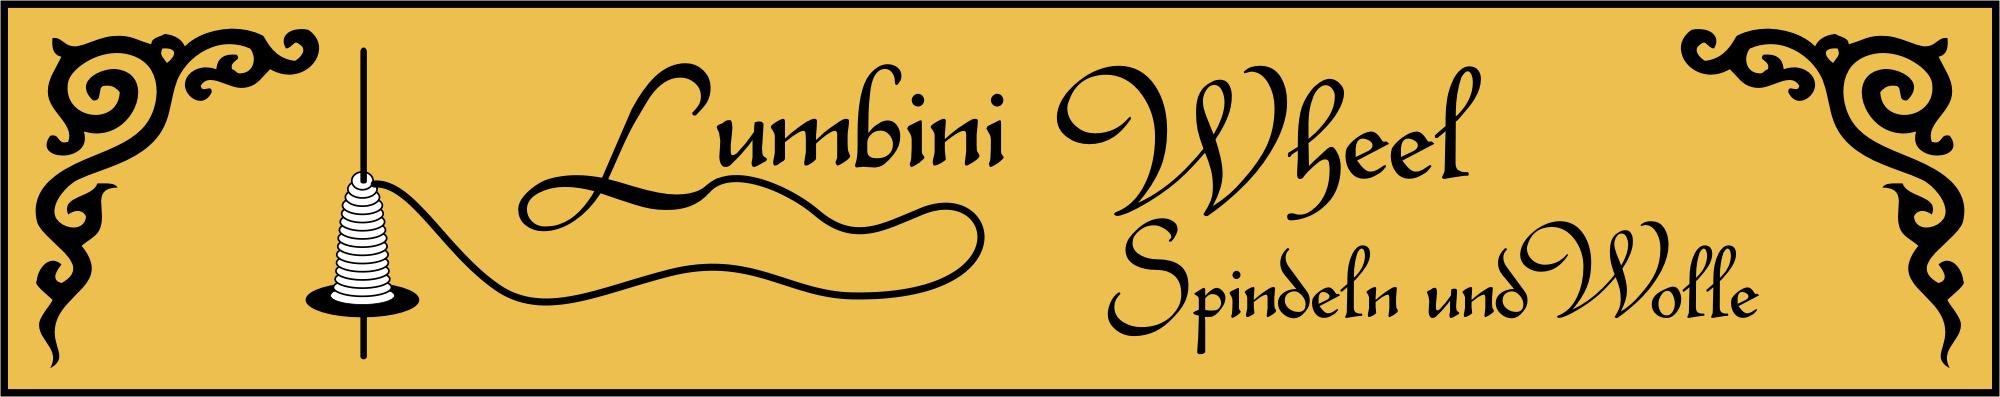 Lumbiniwheel Shop